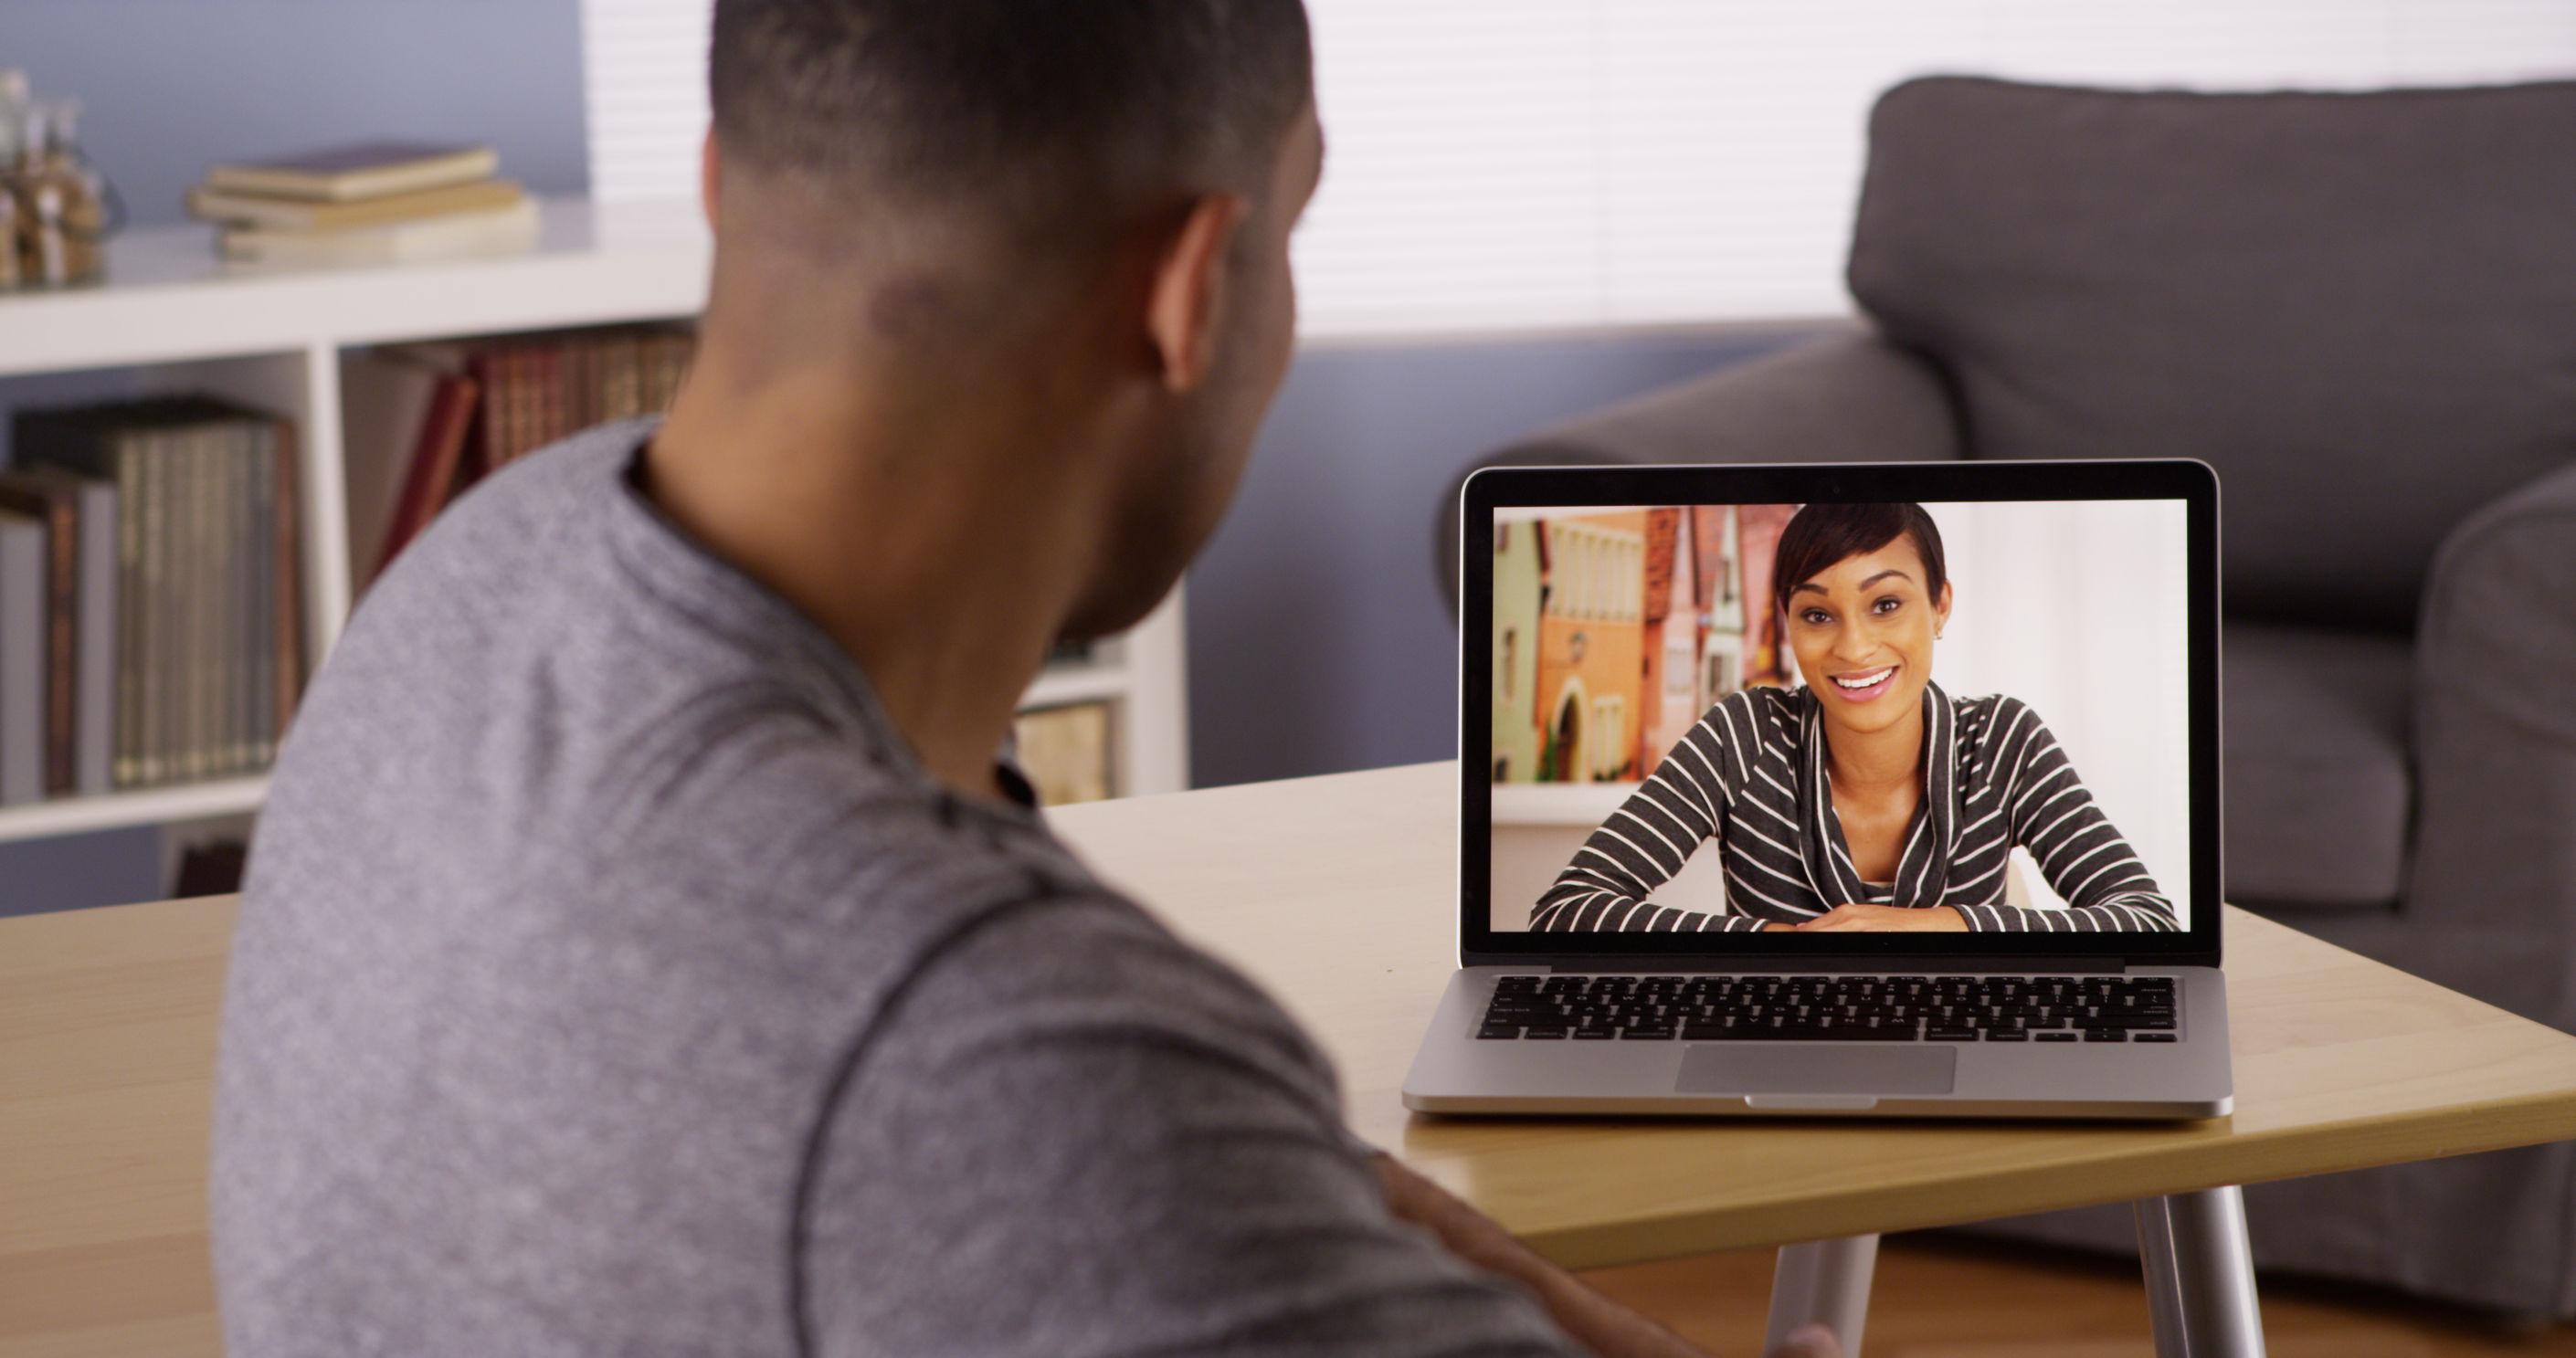 bedste pick up linjer dating sites chatter dating apps